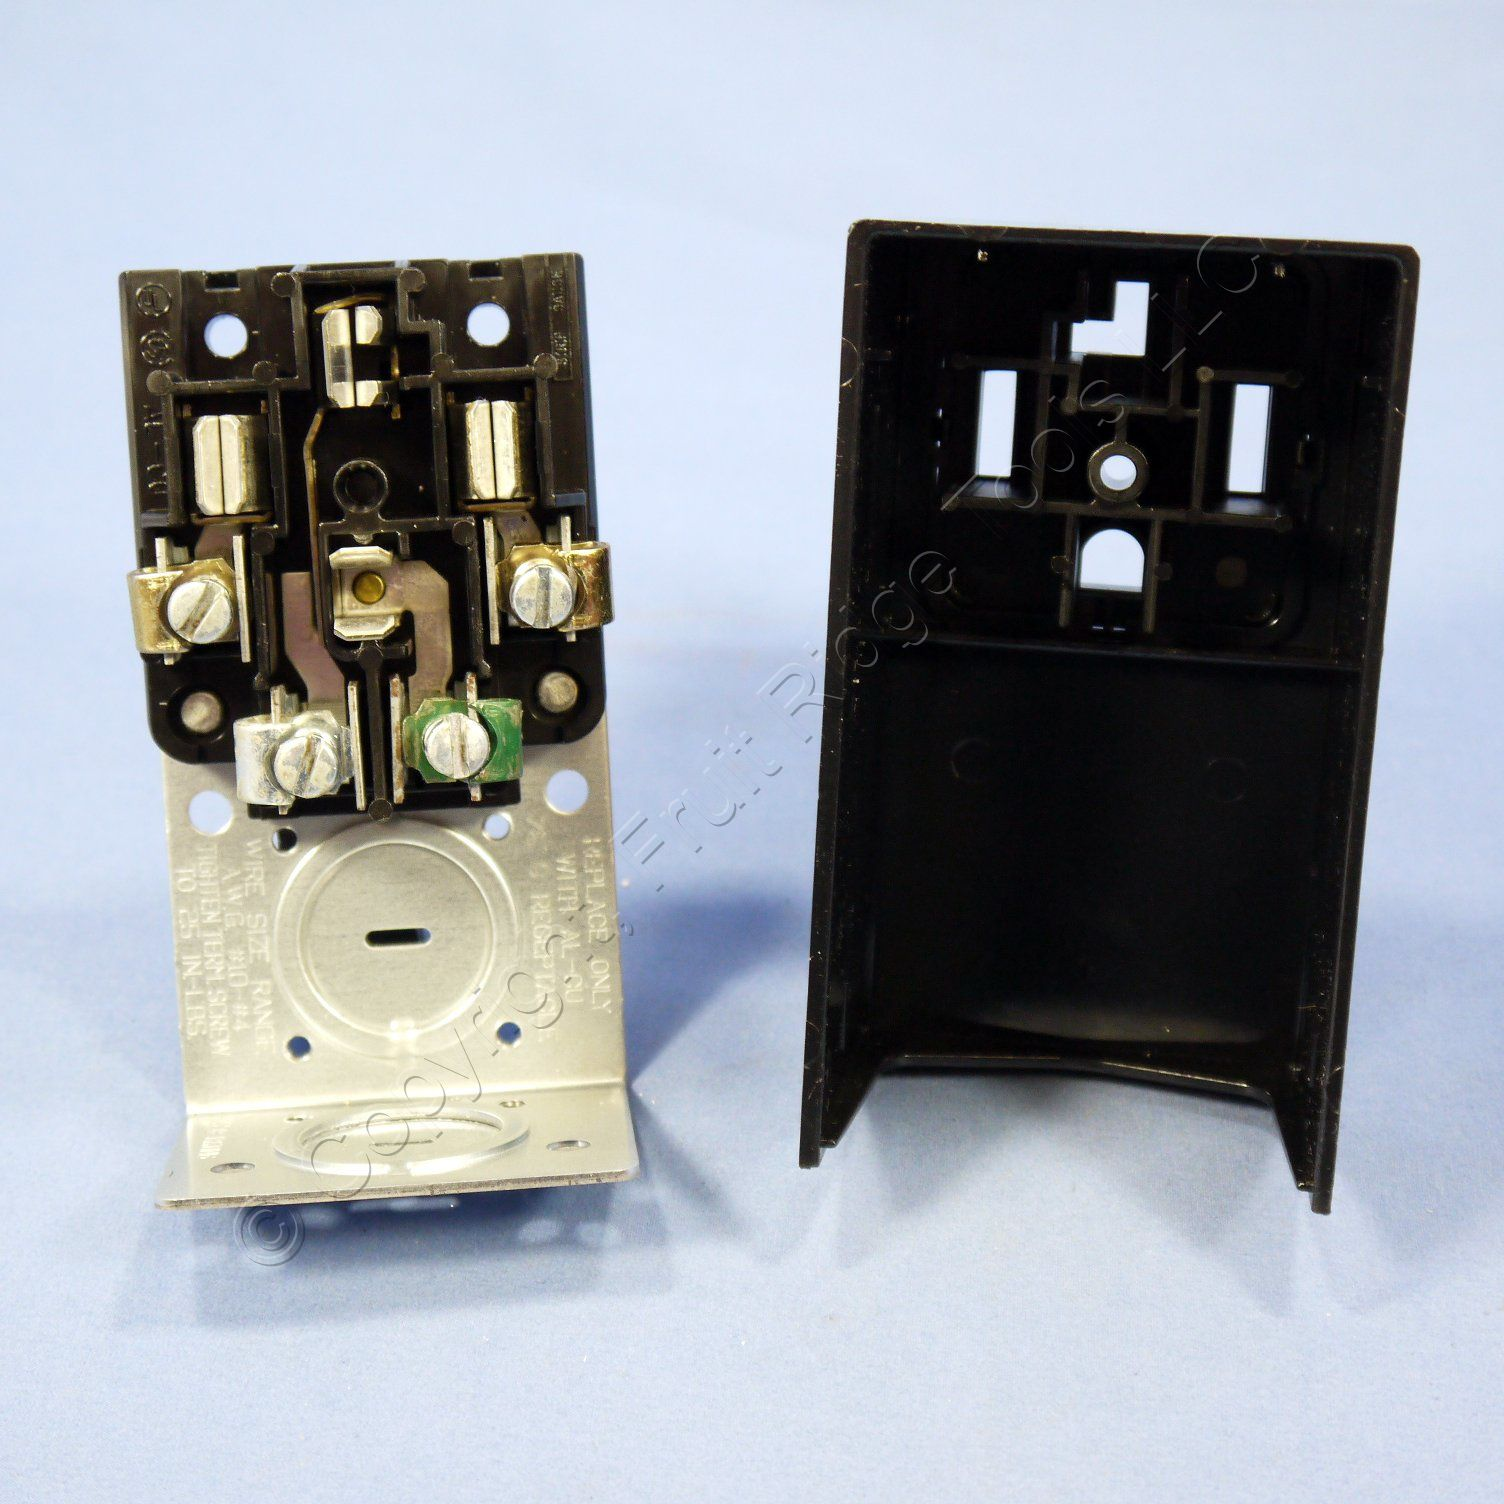 leviton power outlet dryer receptacle 4 wire nema 14 30 30a 125 250v box 55054 ebay